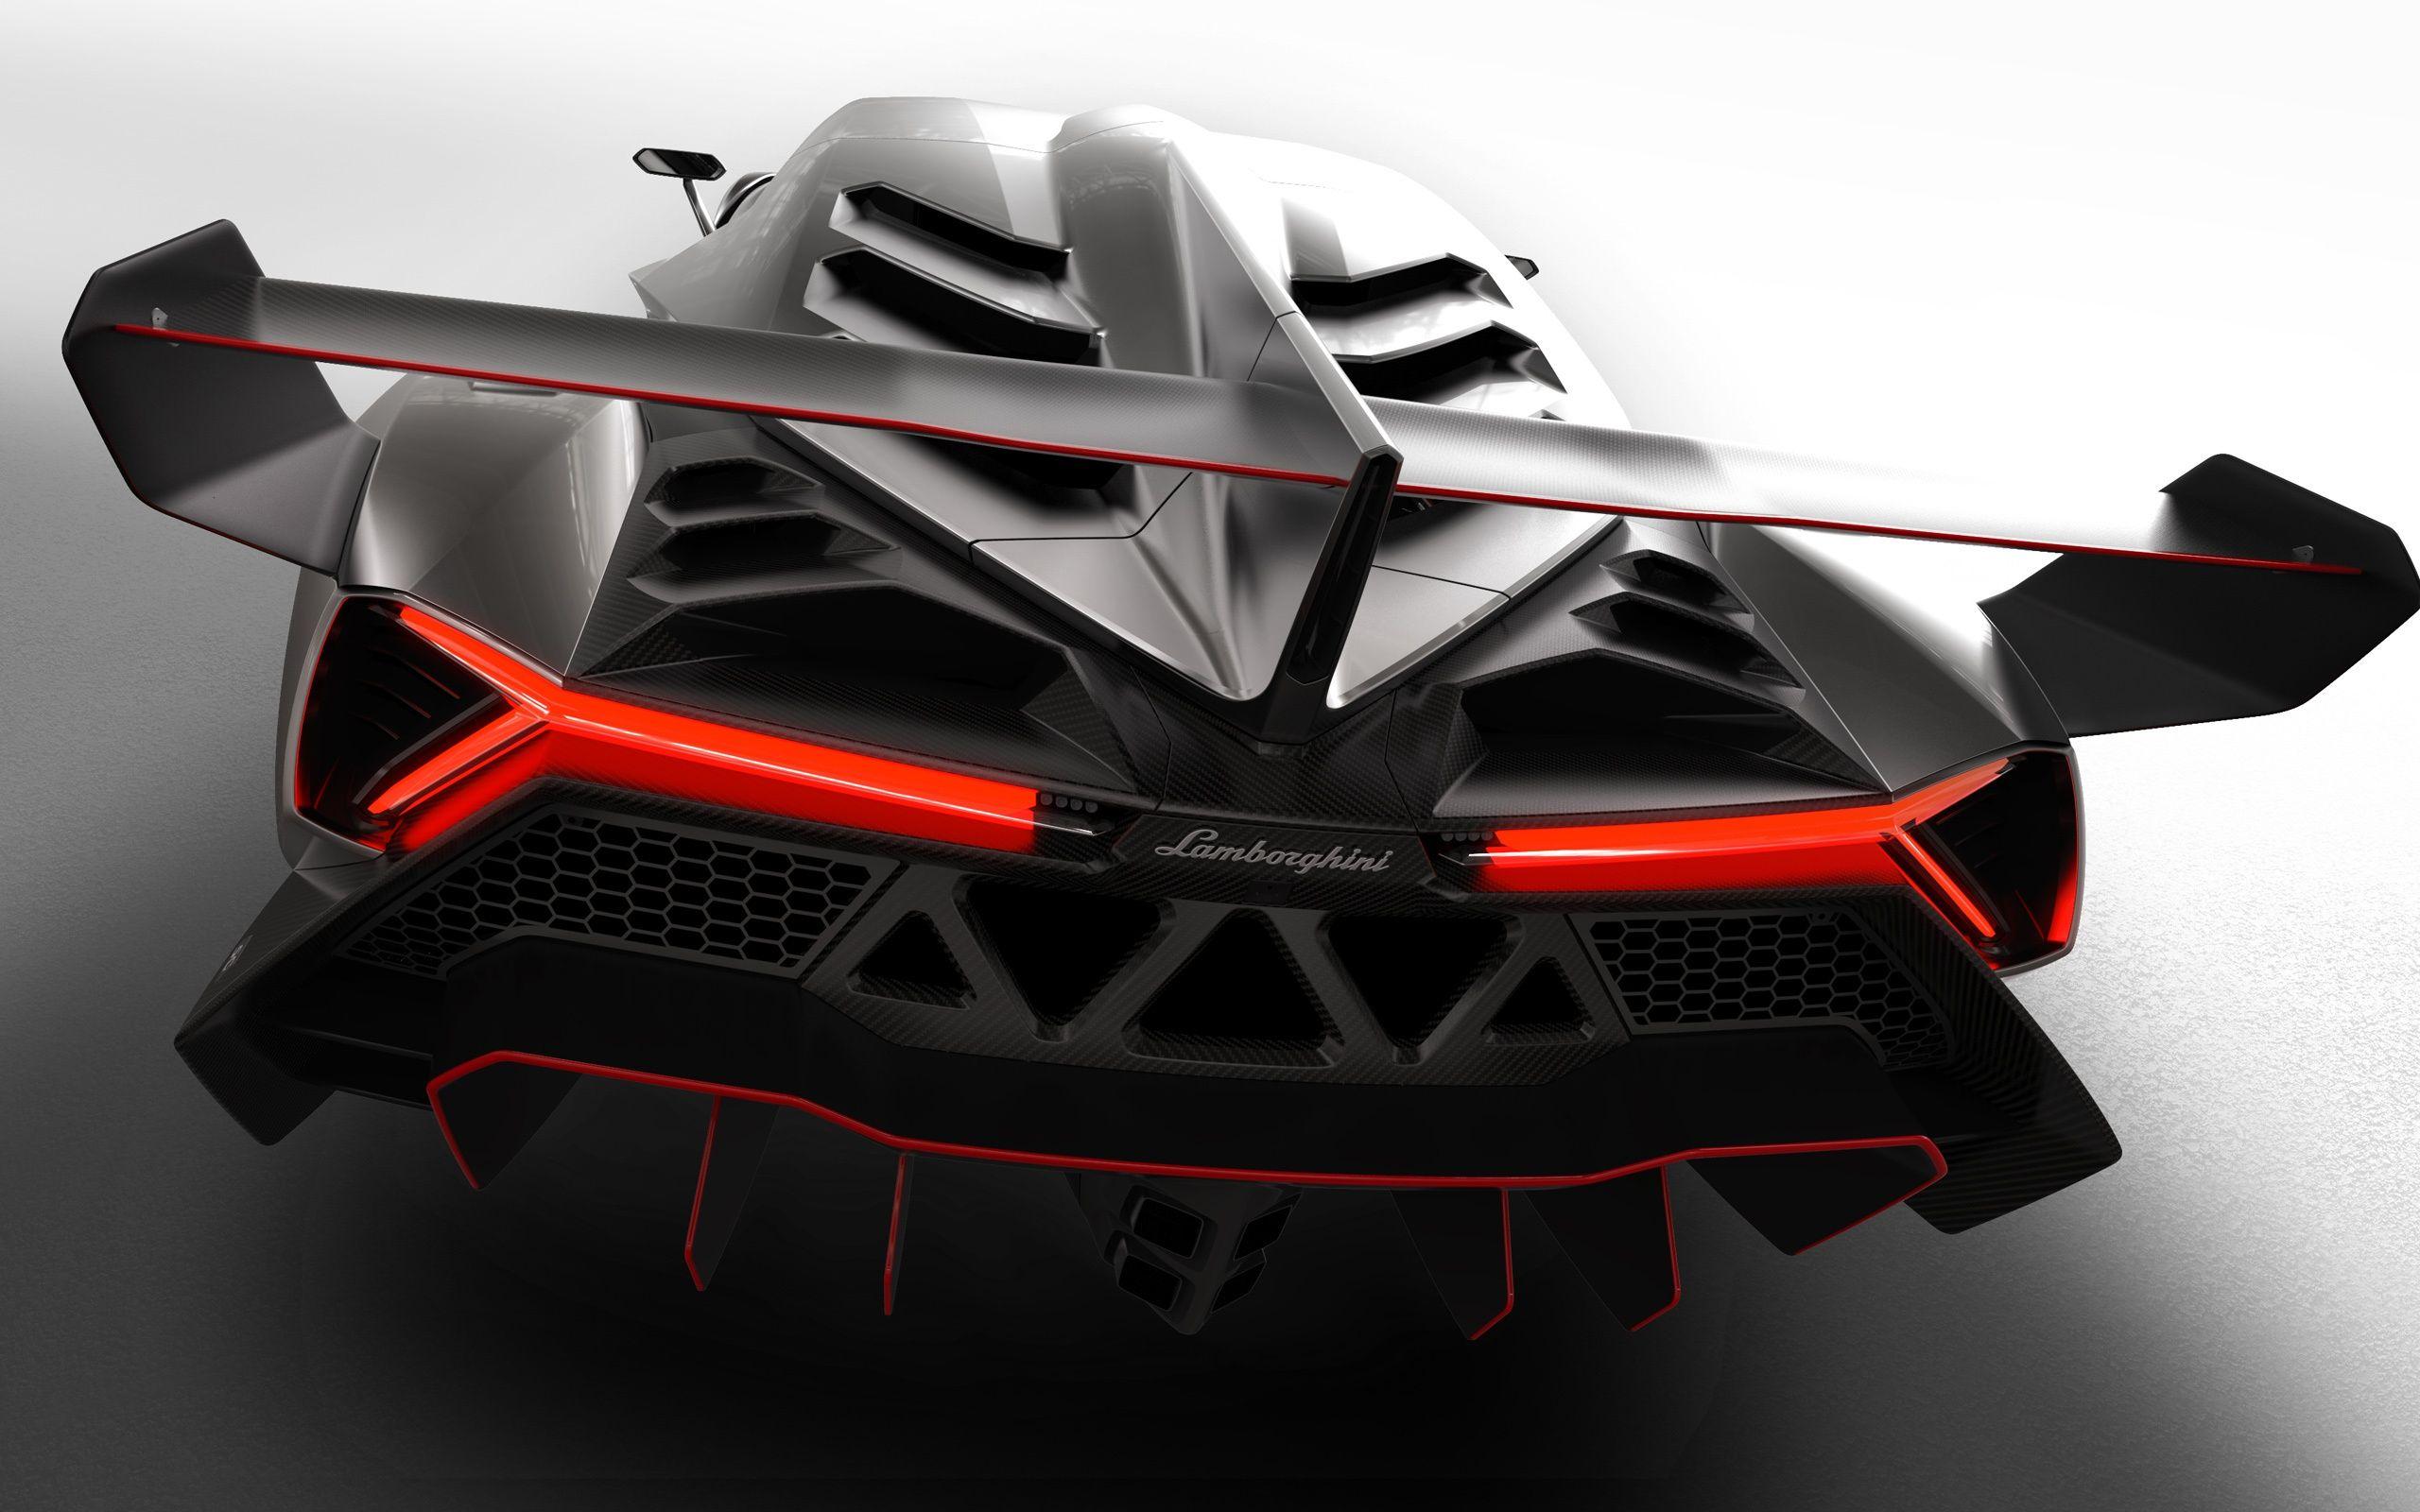 2013 Lamborghini Veneno Traseira Close Up Papeis De Parede